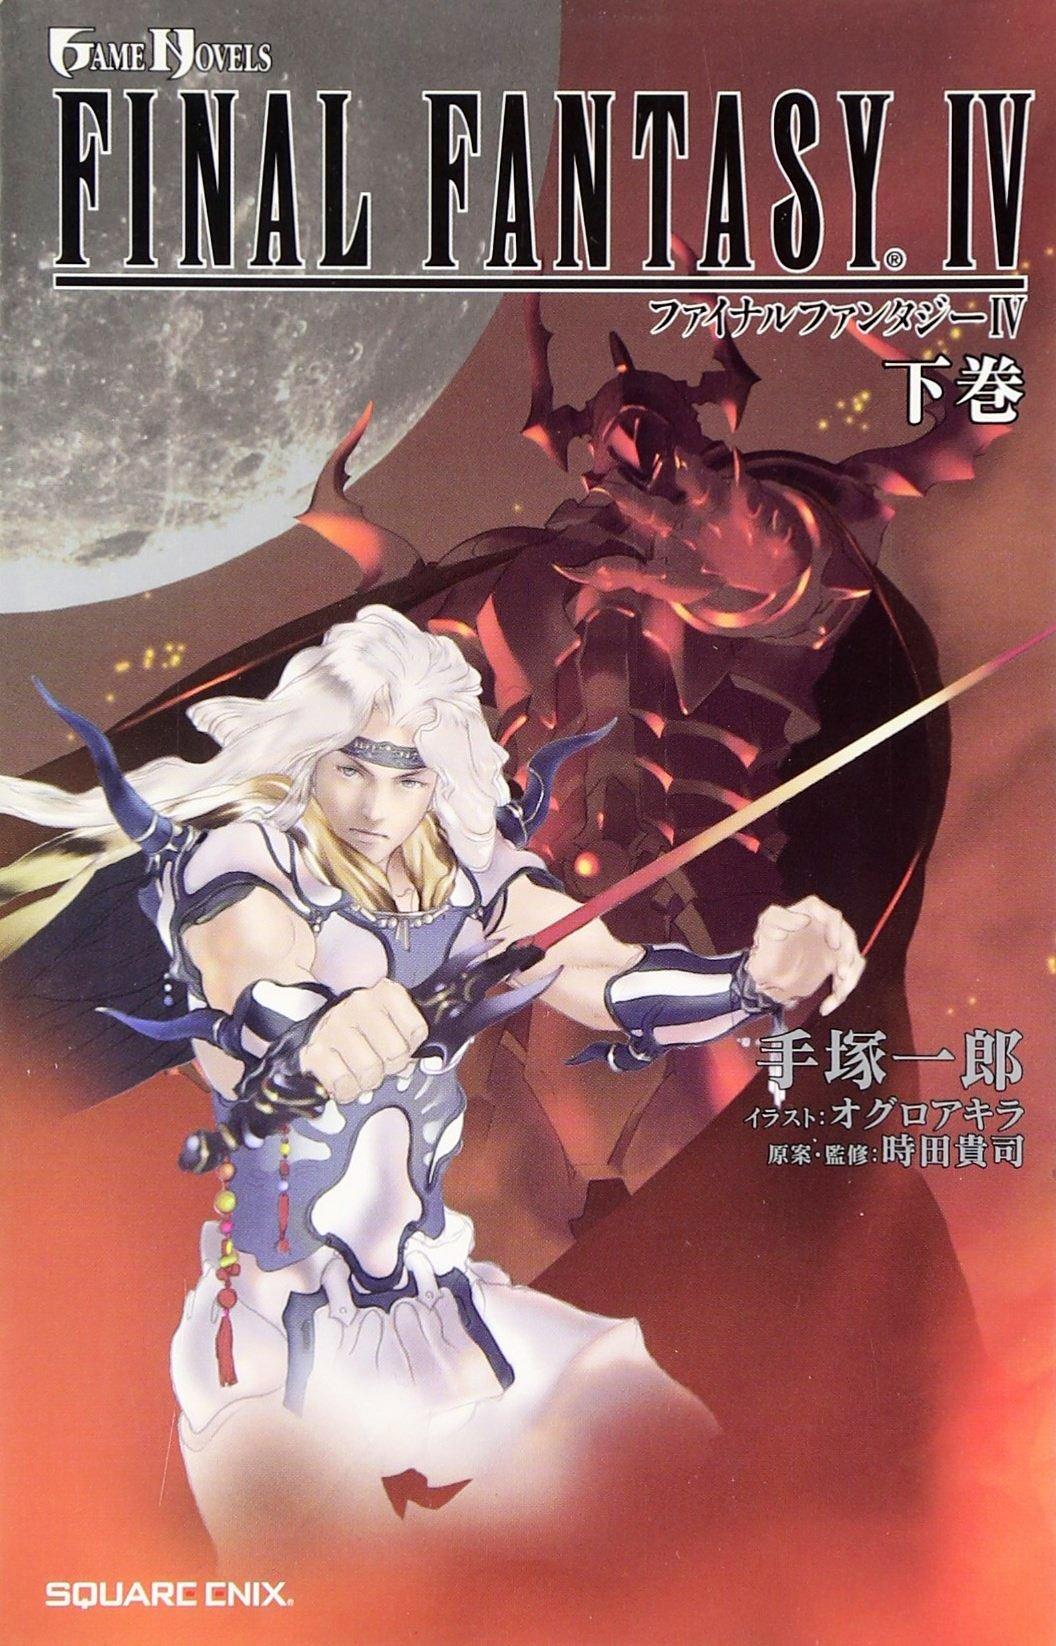 Final Fantasy IV (2nd part)